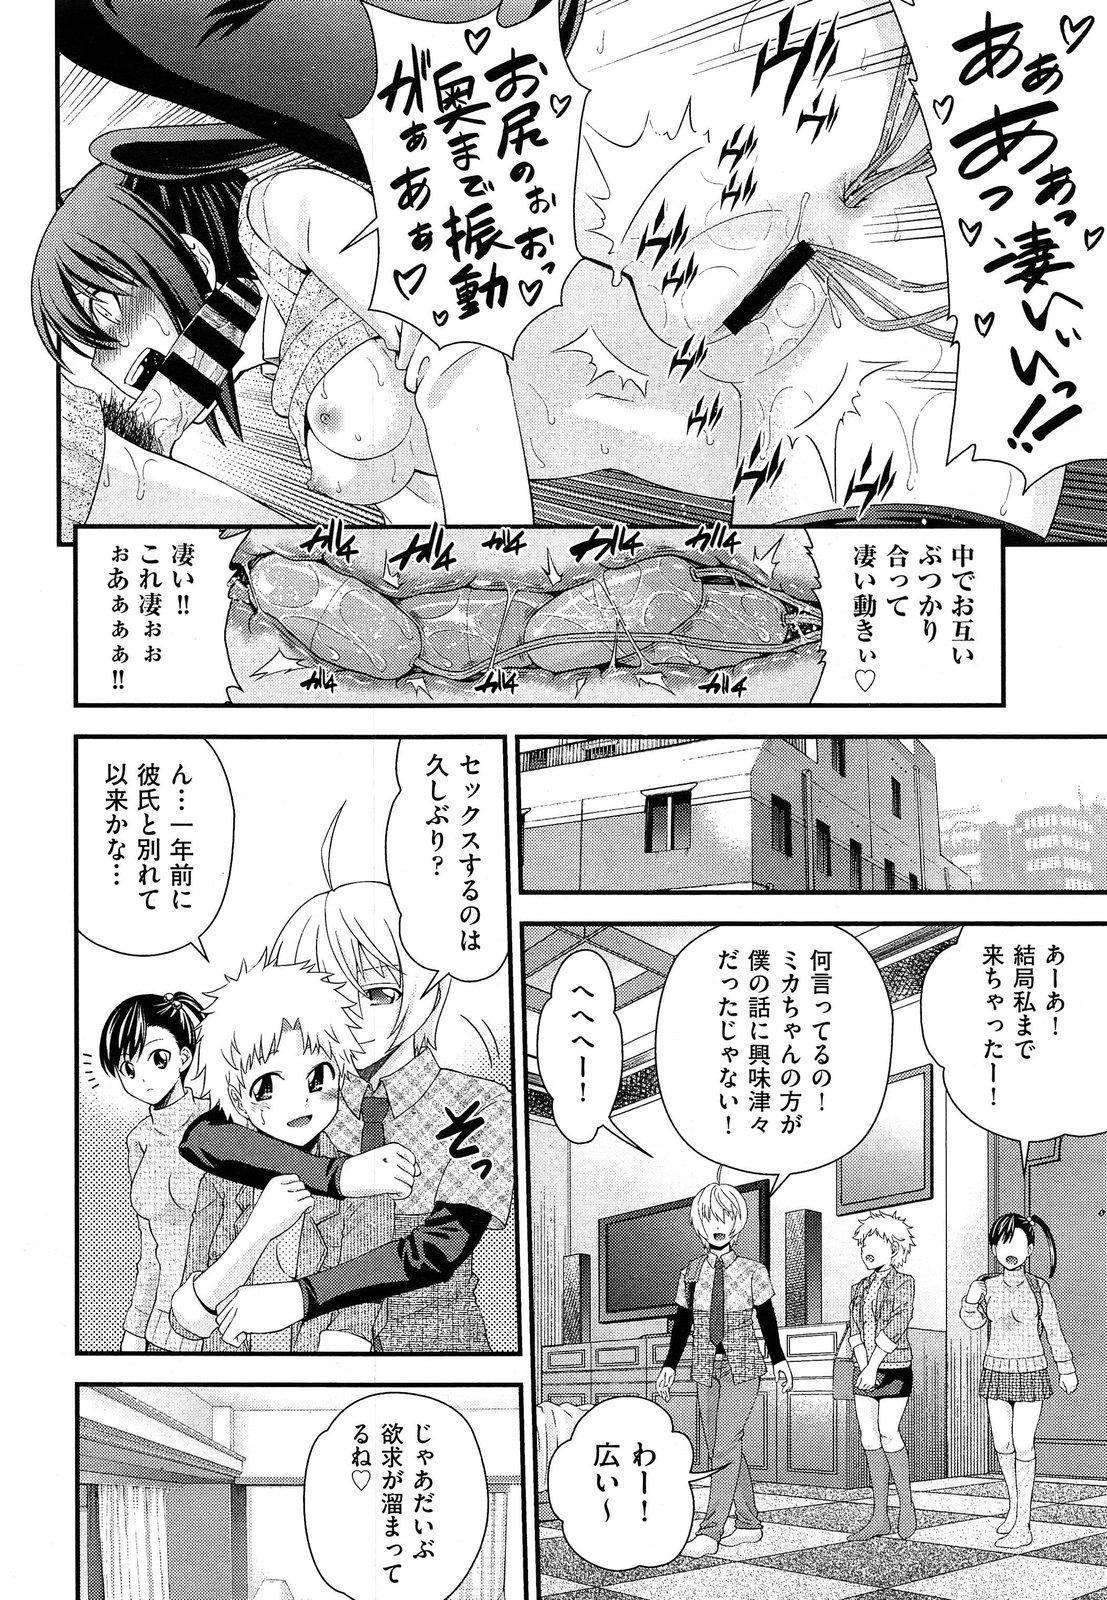 Kyoudai Replace 103